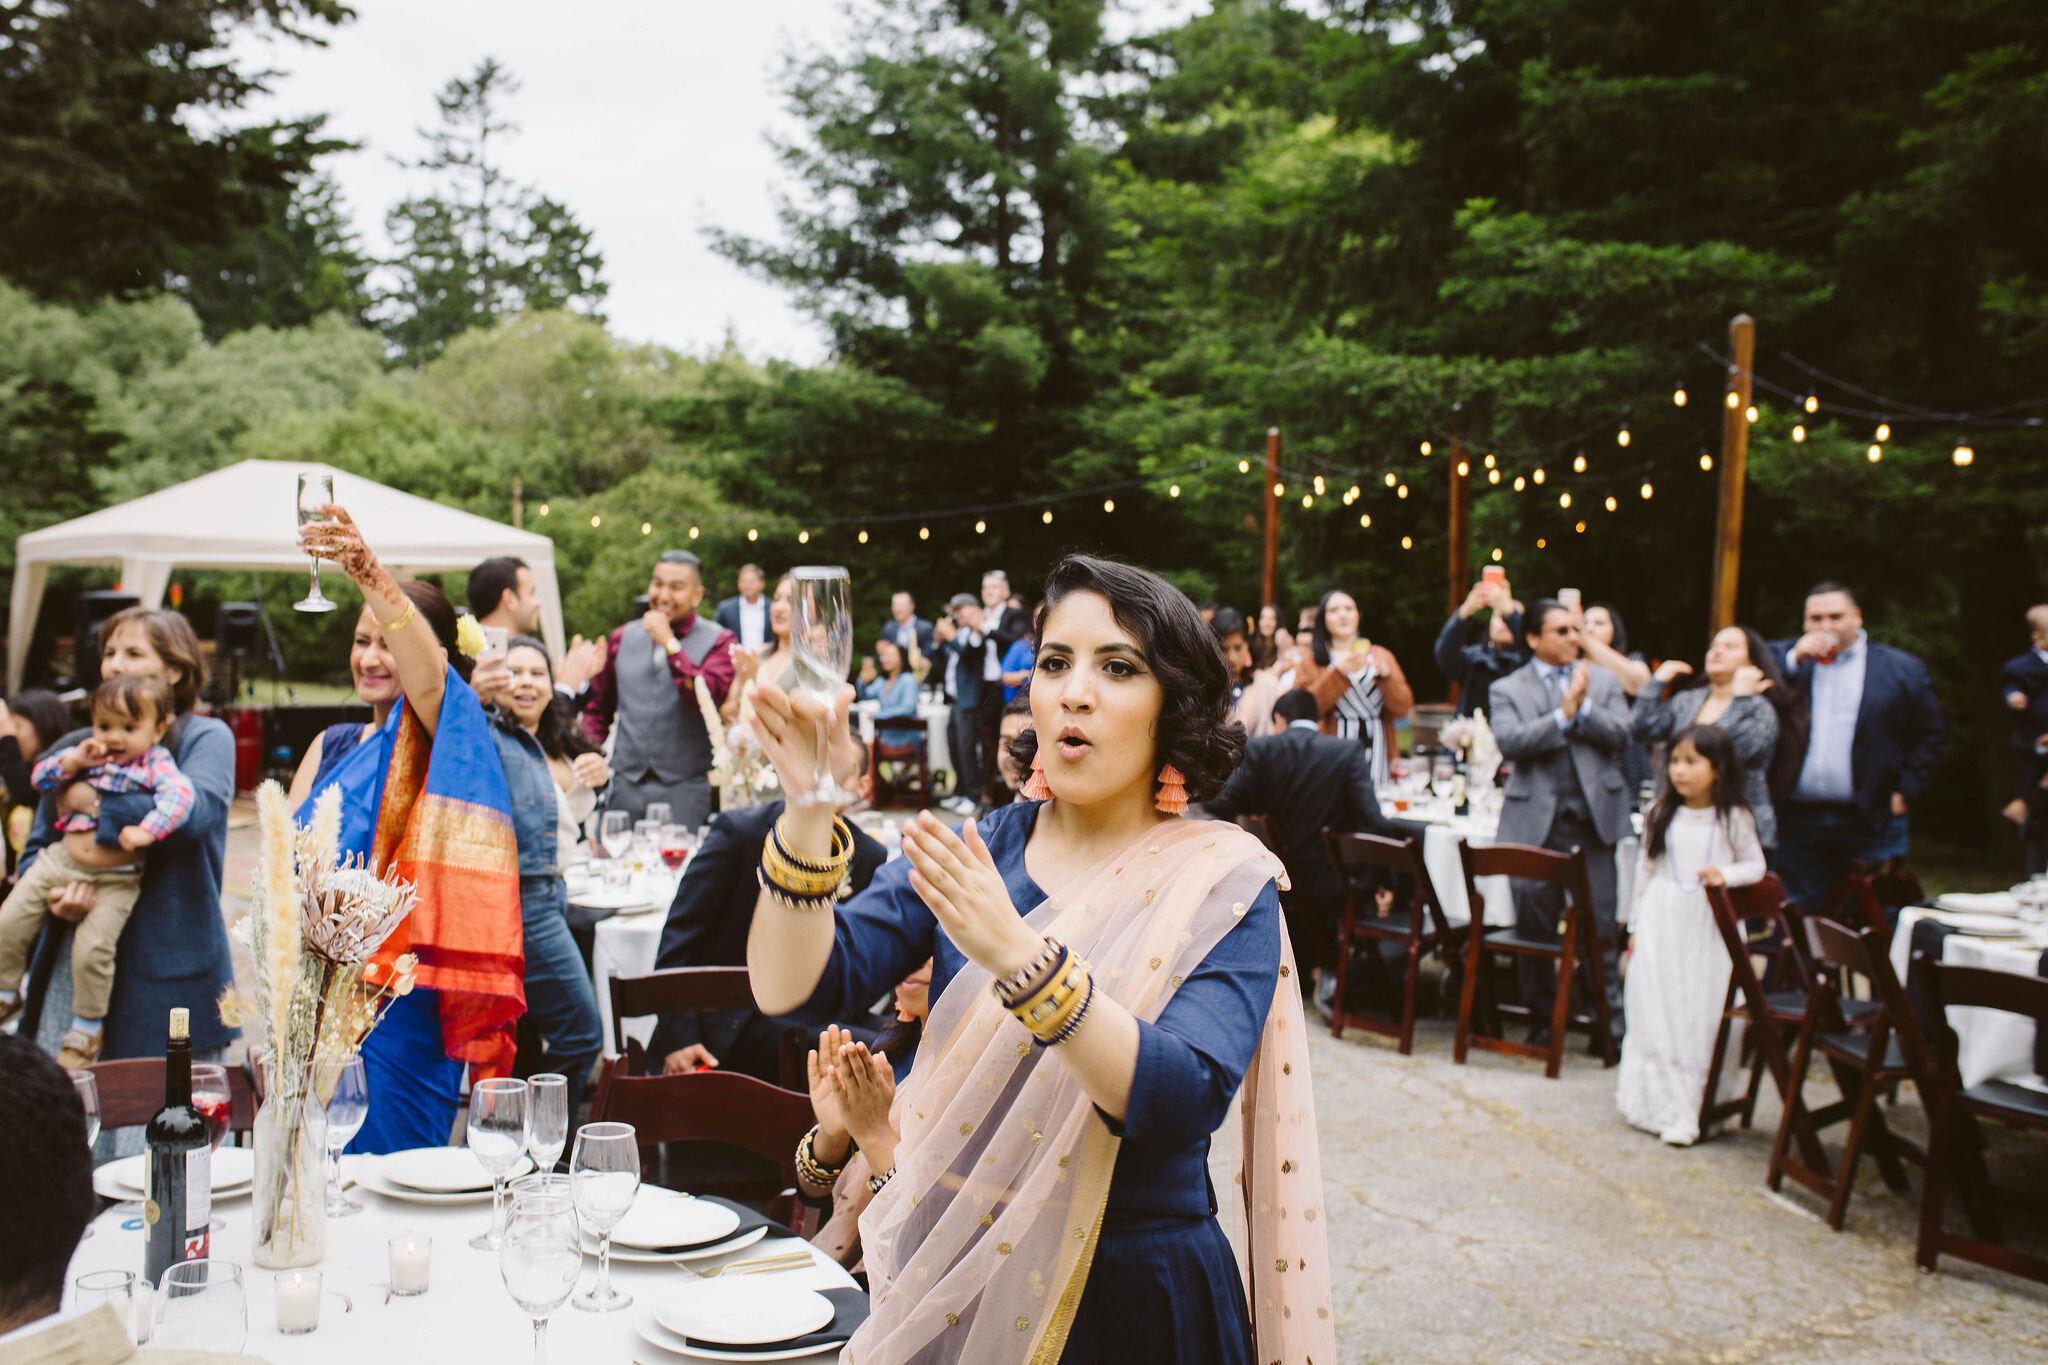 Venture-Retreat-Center-Wedding-Pescadero-Sat-Aaron-Pritam-The-Shalom-Imaginative-552.jpg